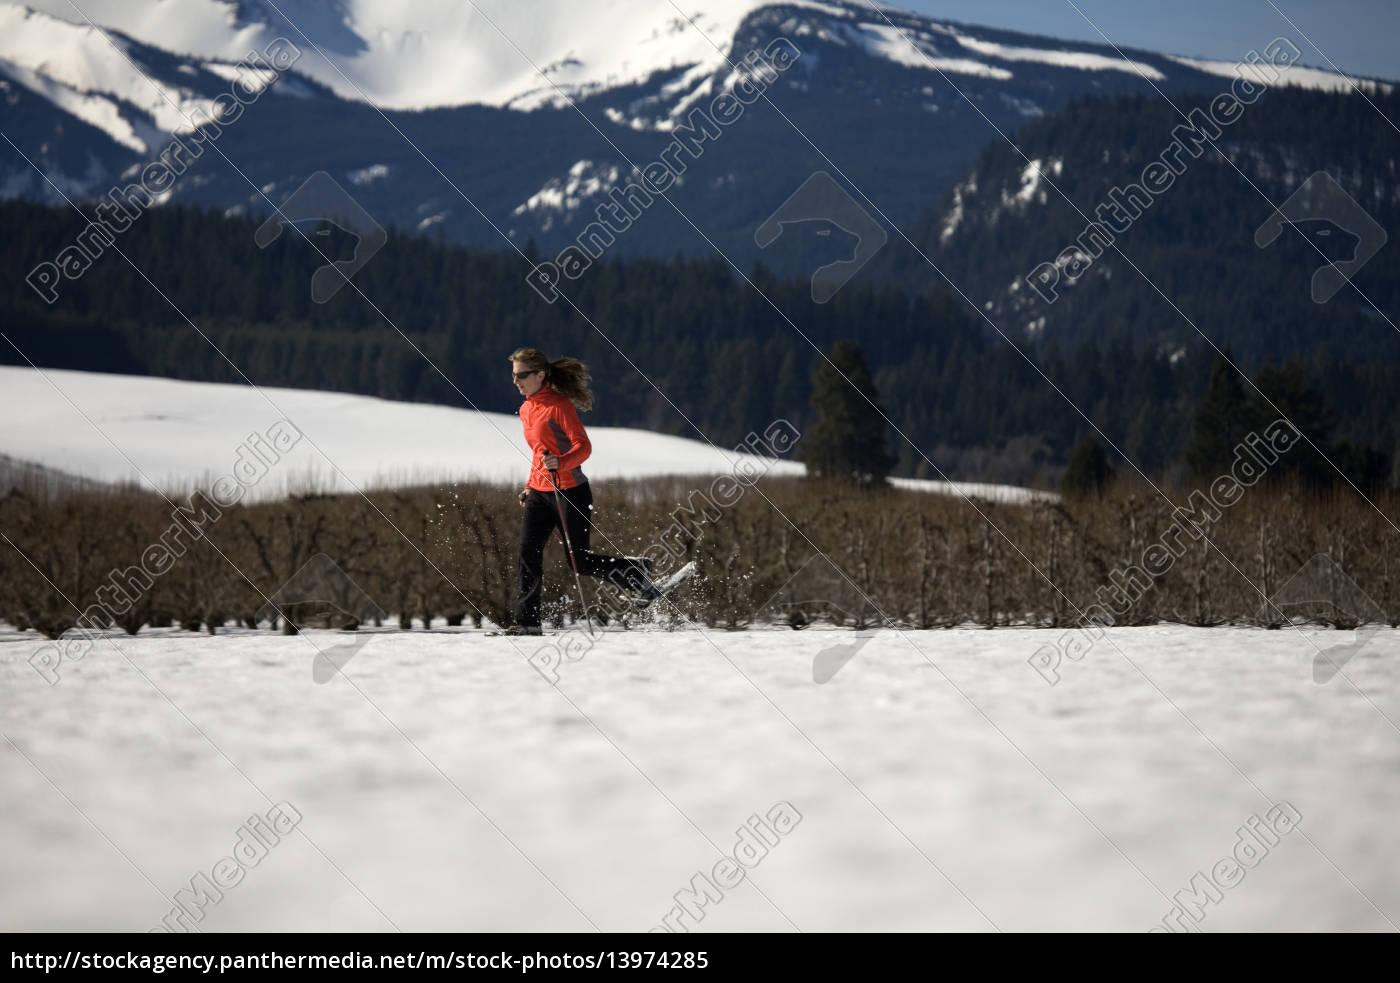 young, woman, runs, through, snow, with - 13974285